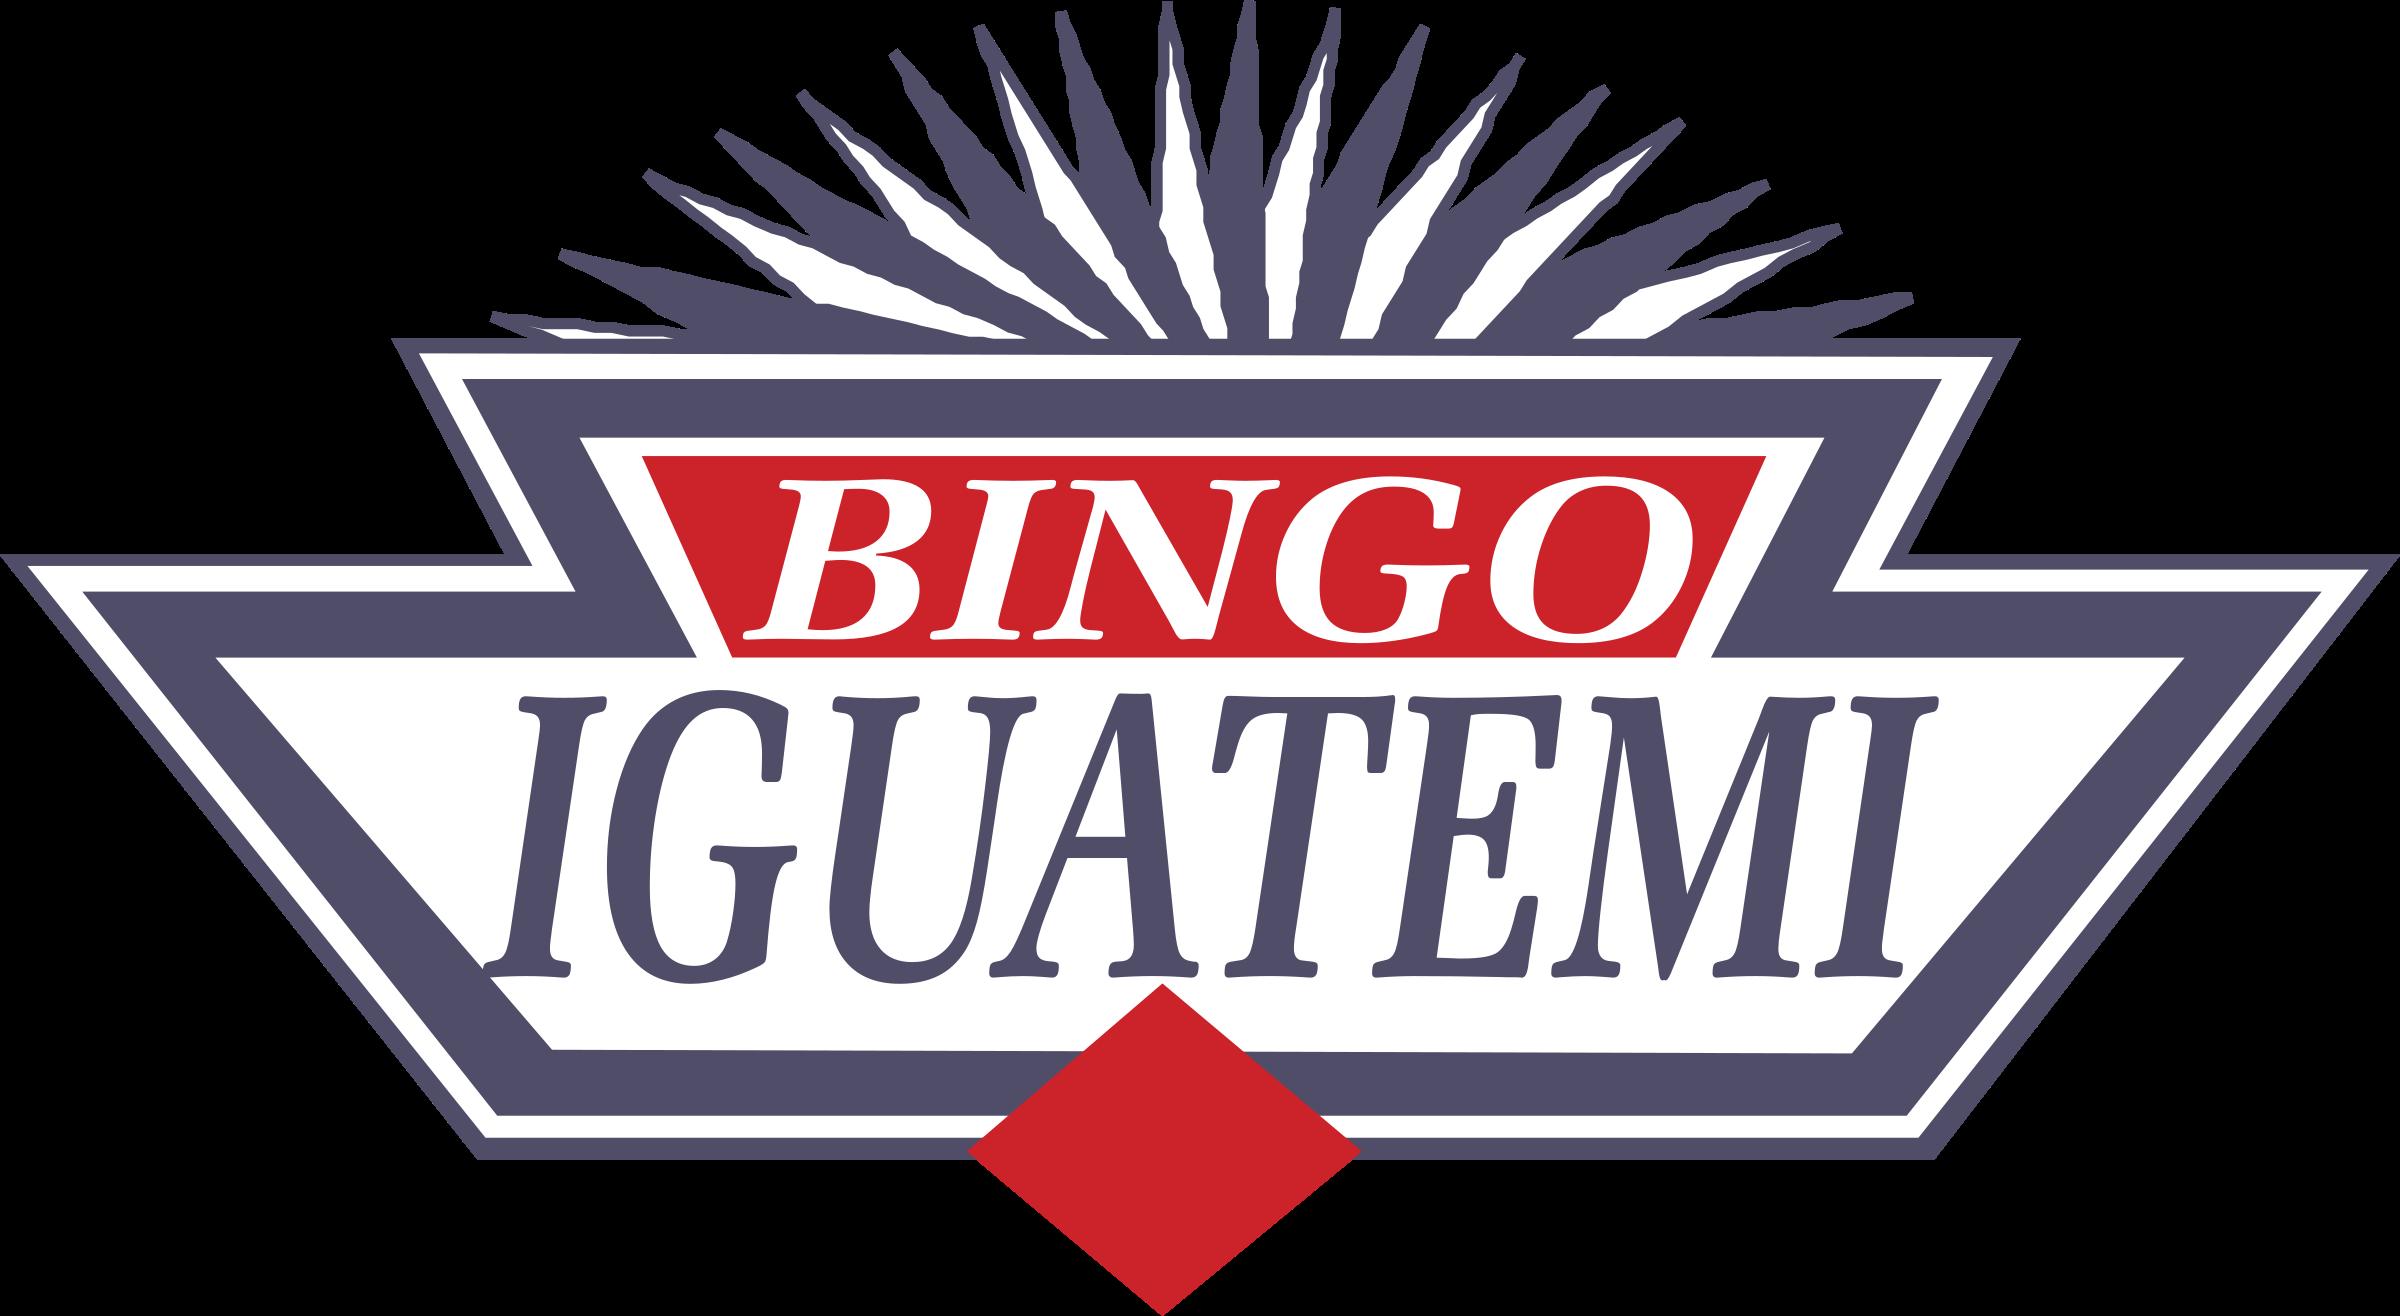 clipart freeuse Iguatemi logo png transparent. Bingo vector